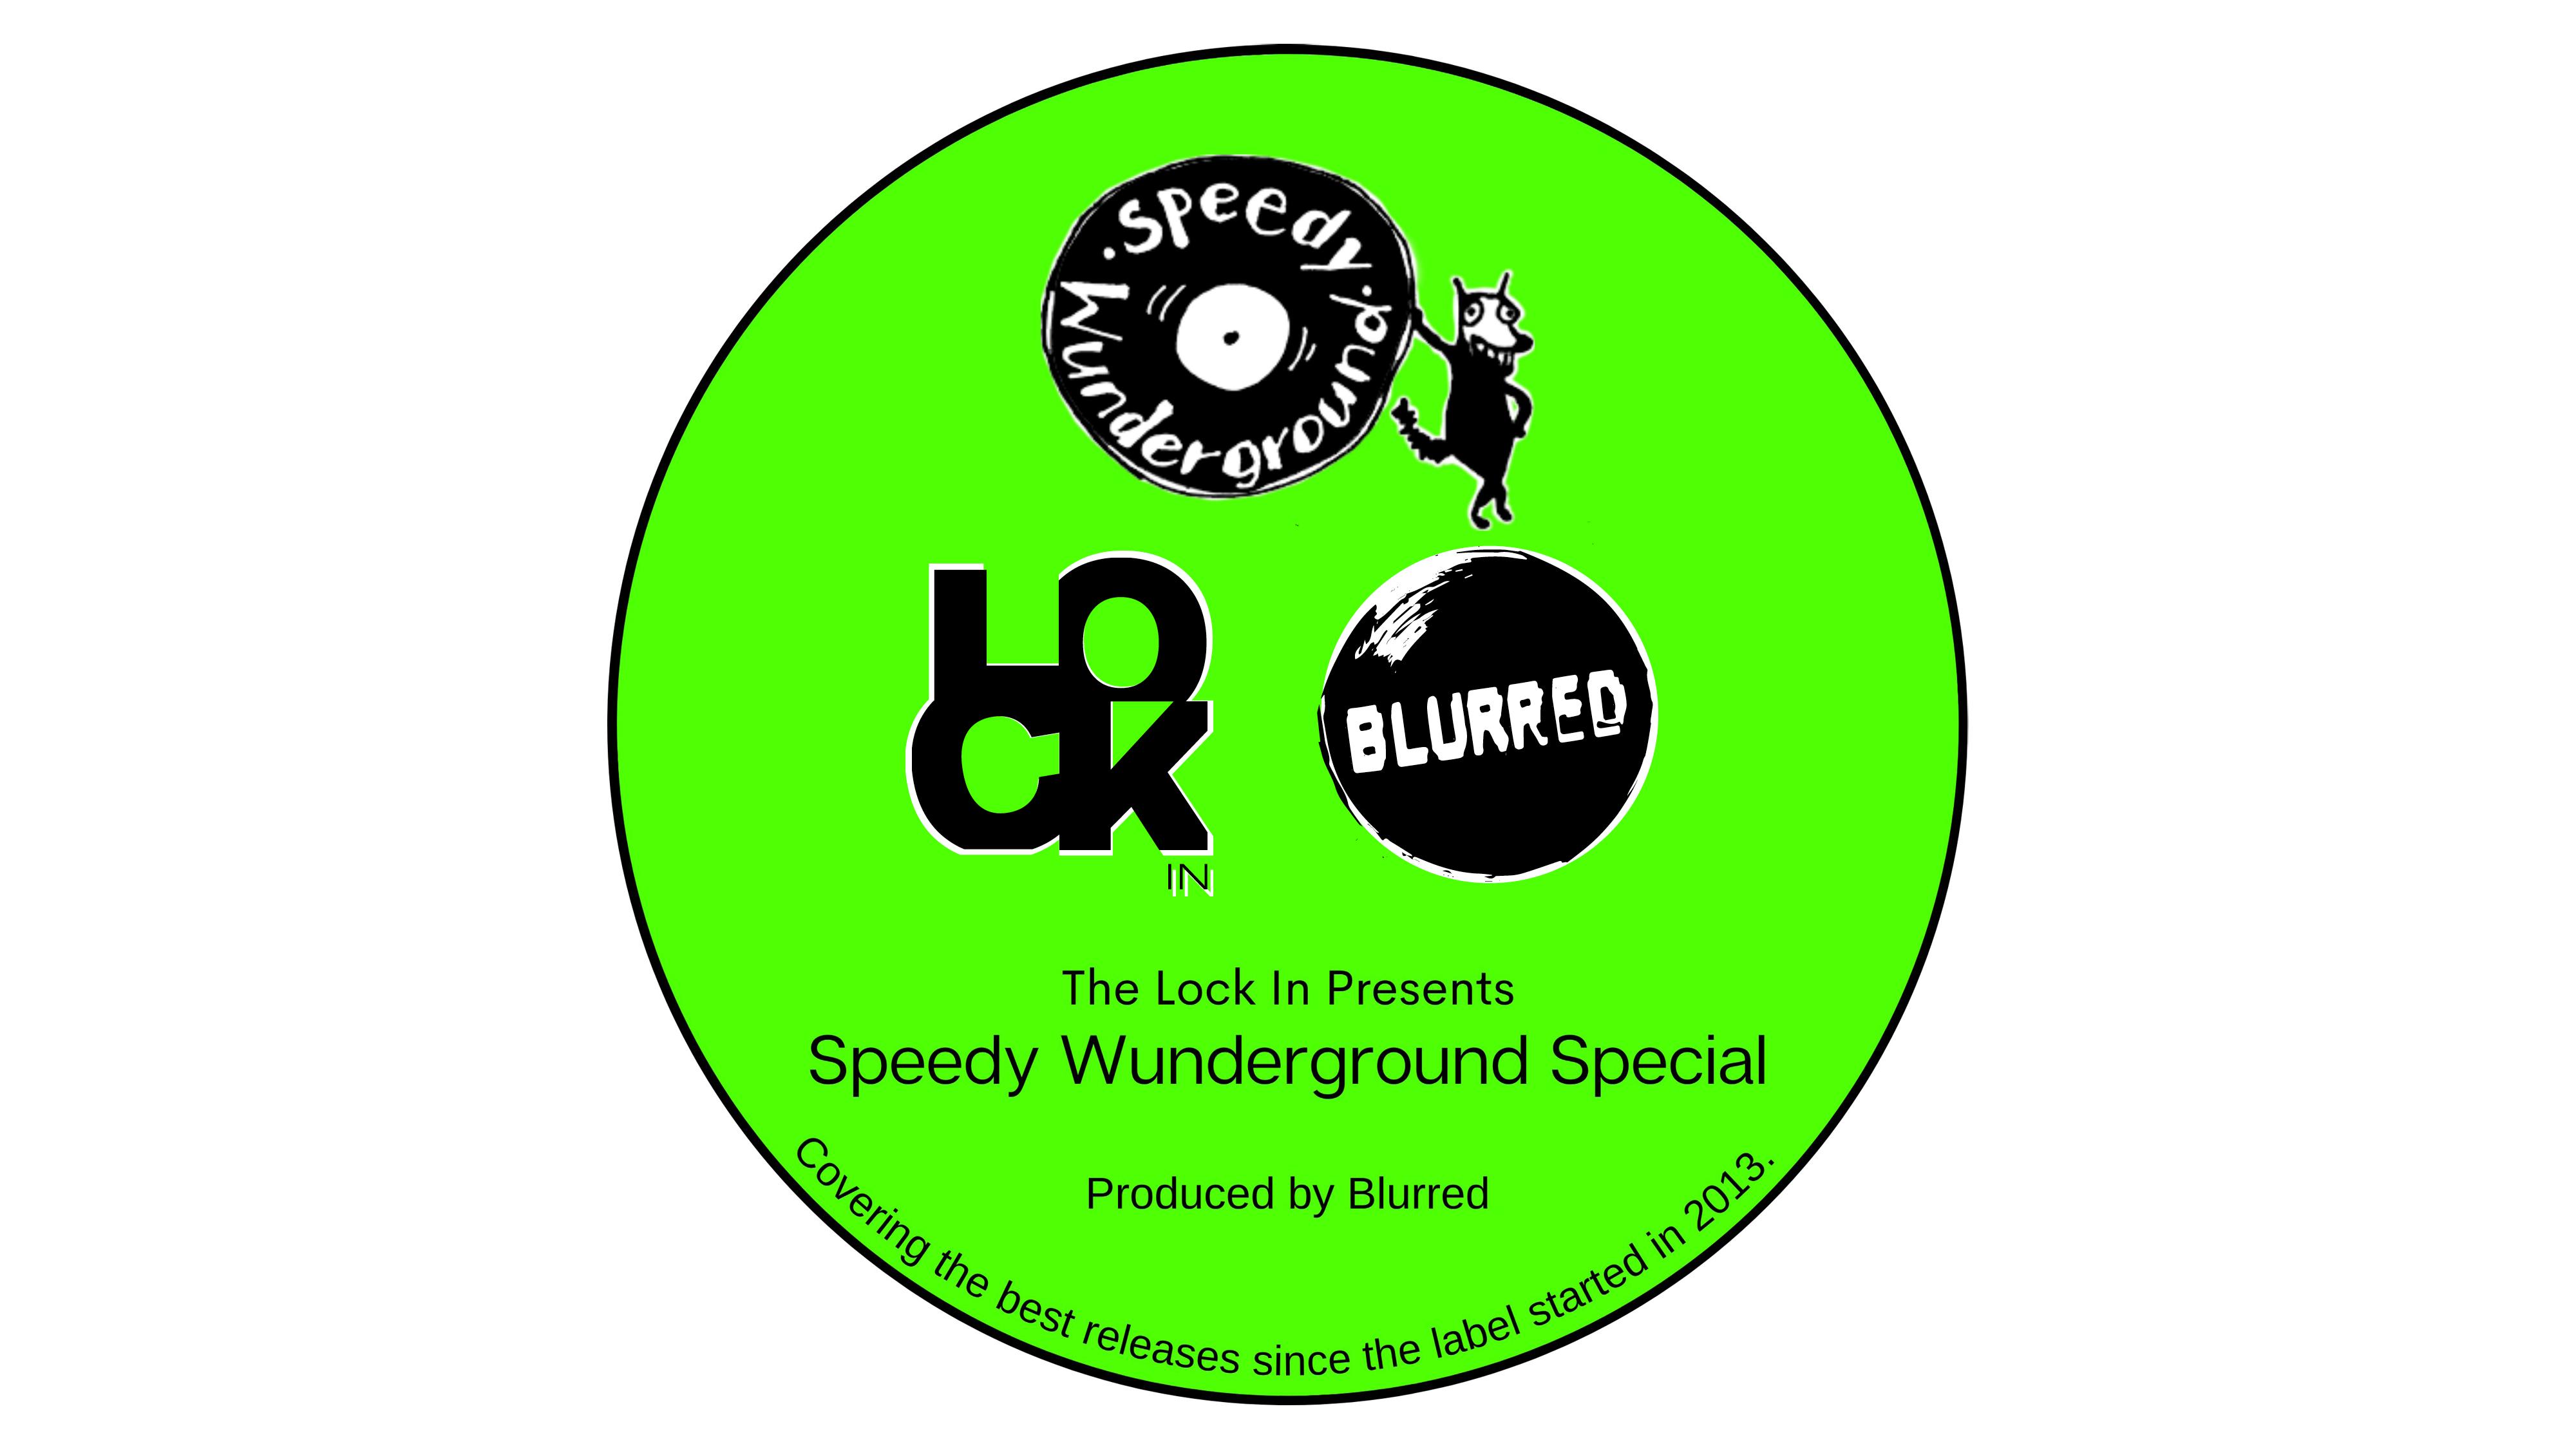 Blurred - Speedy Wunderground Special - Thursday 11th March 2021